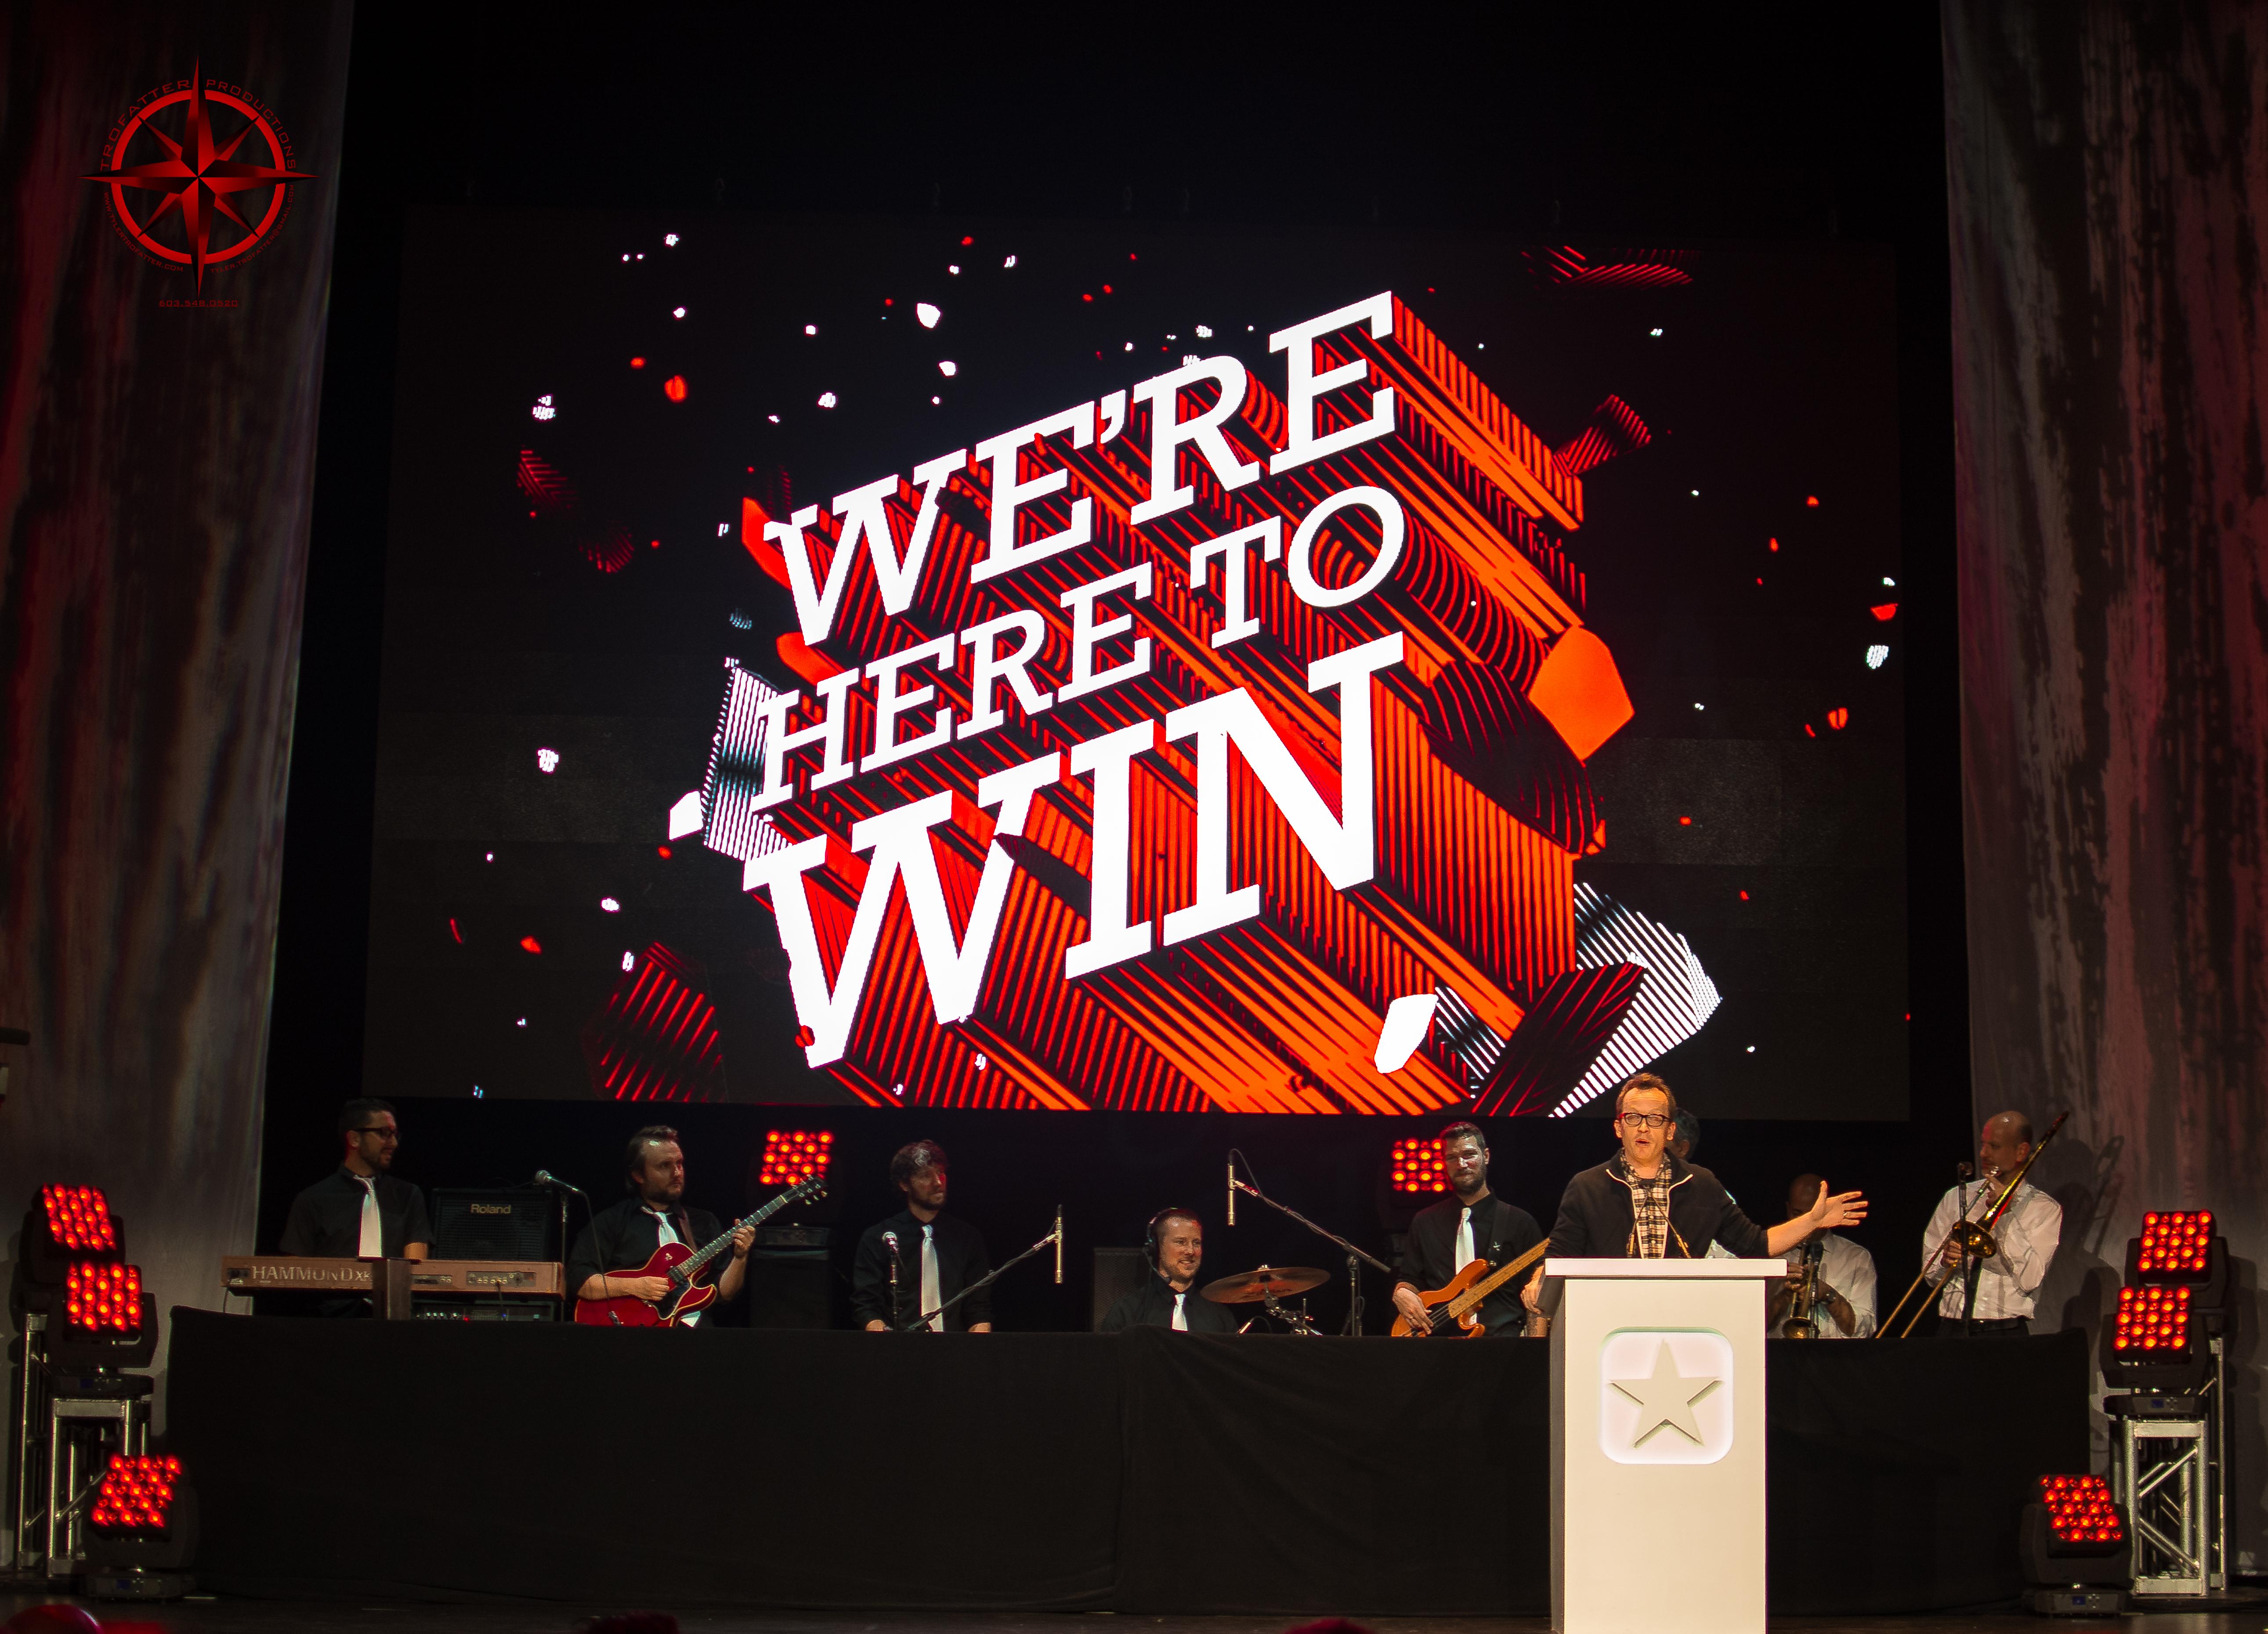 Corporate Award Show